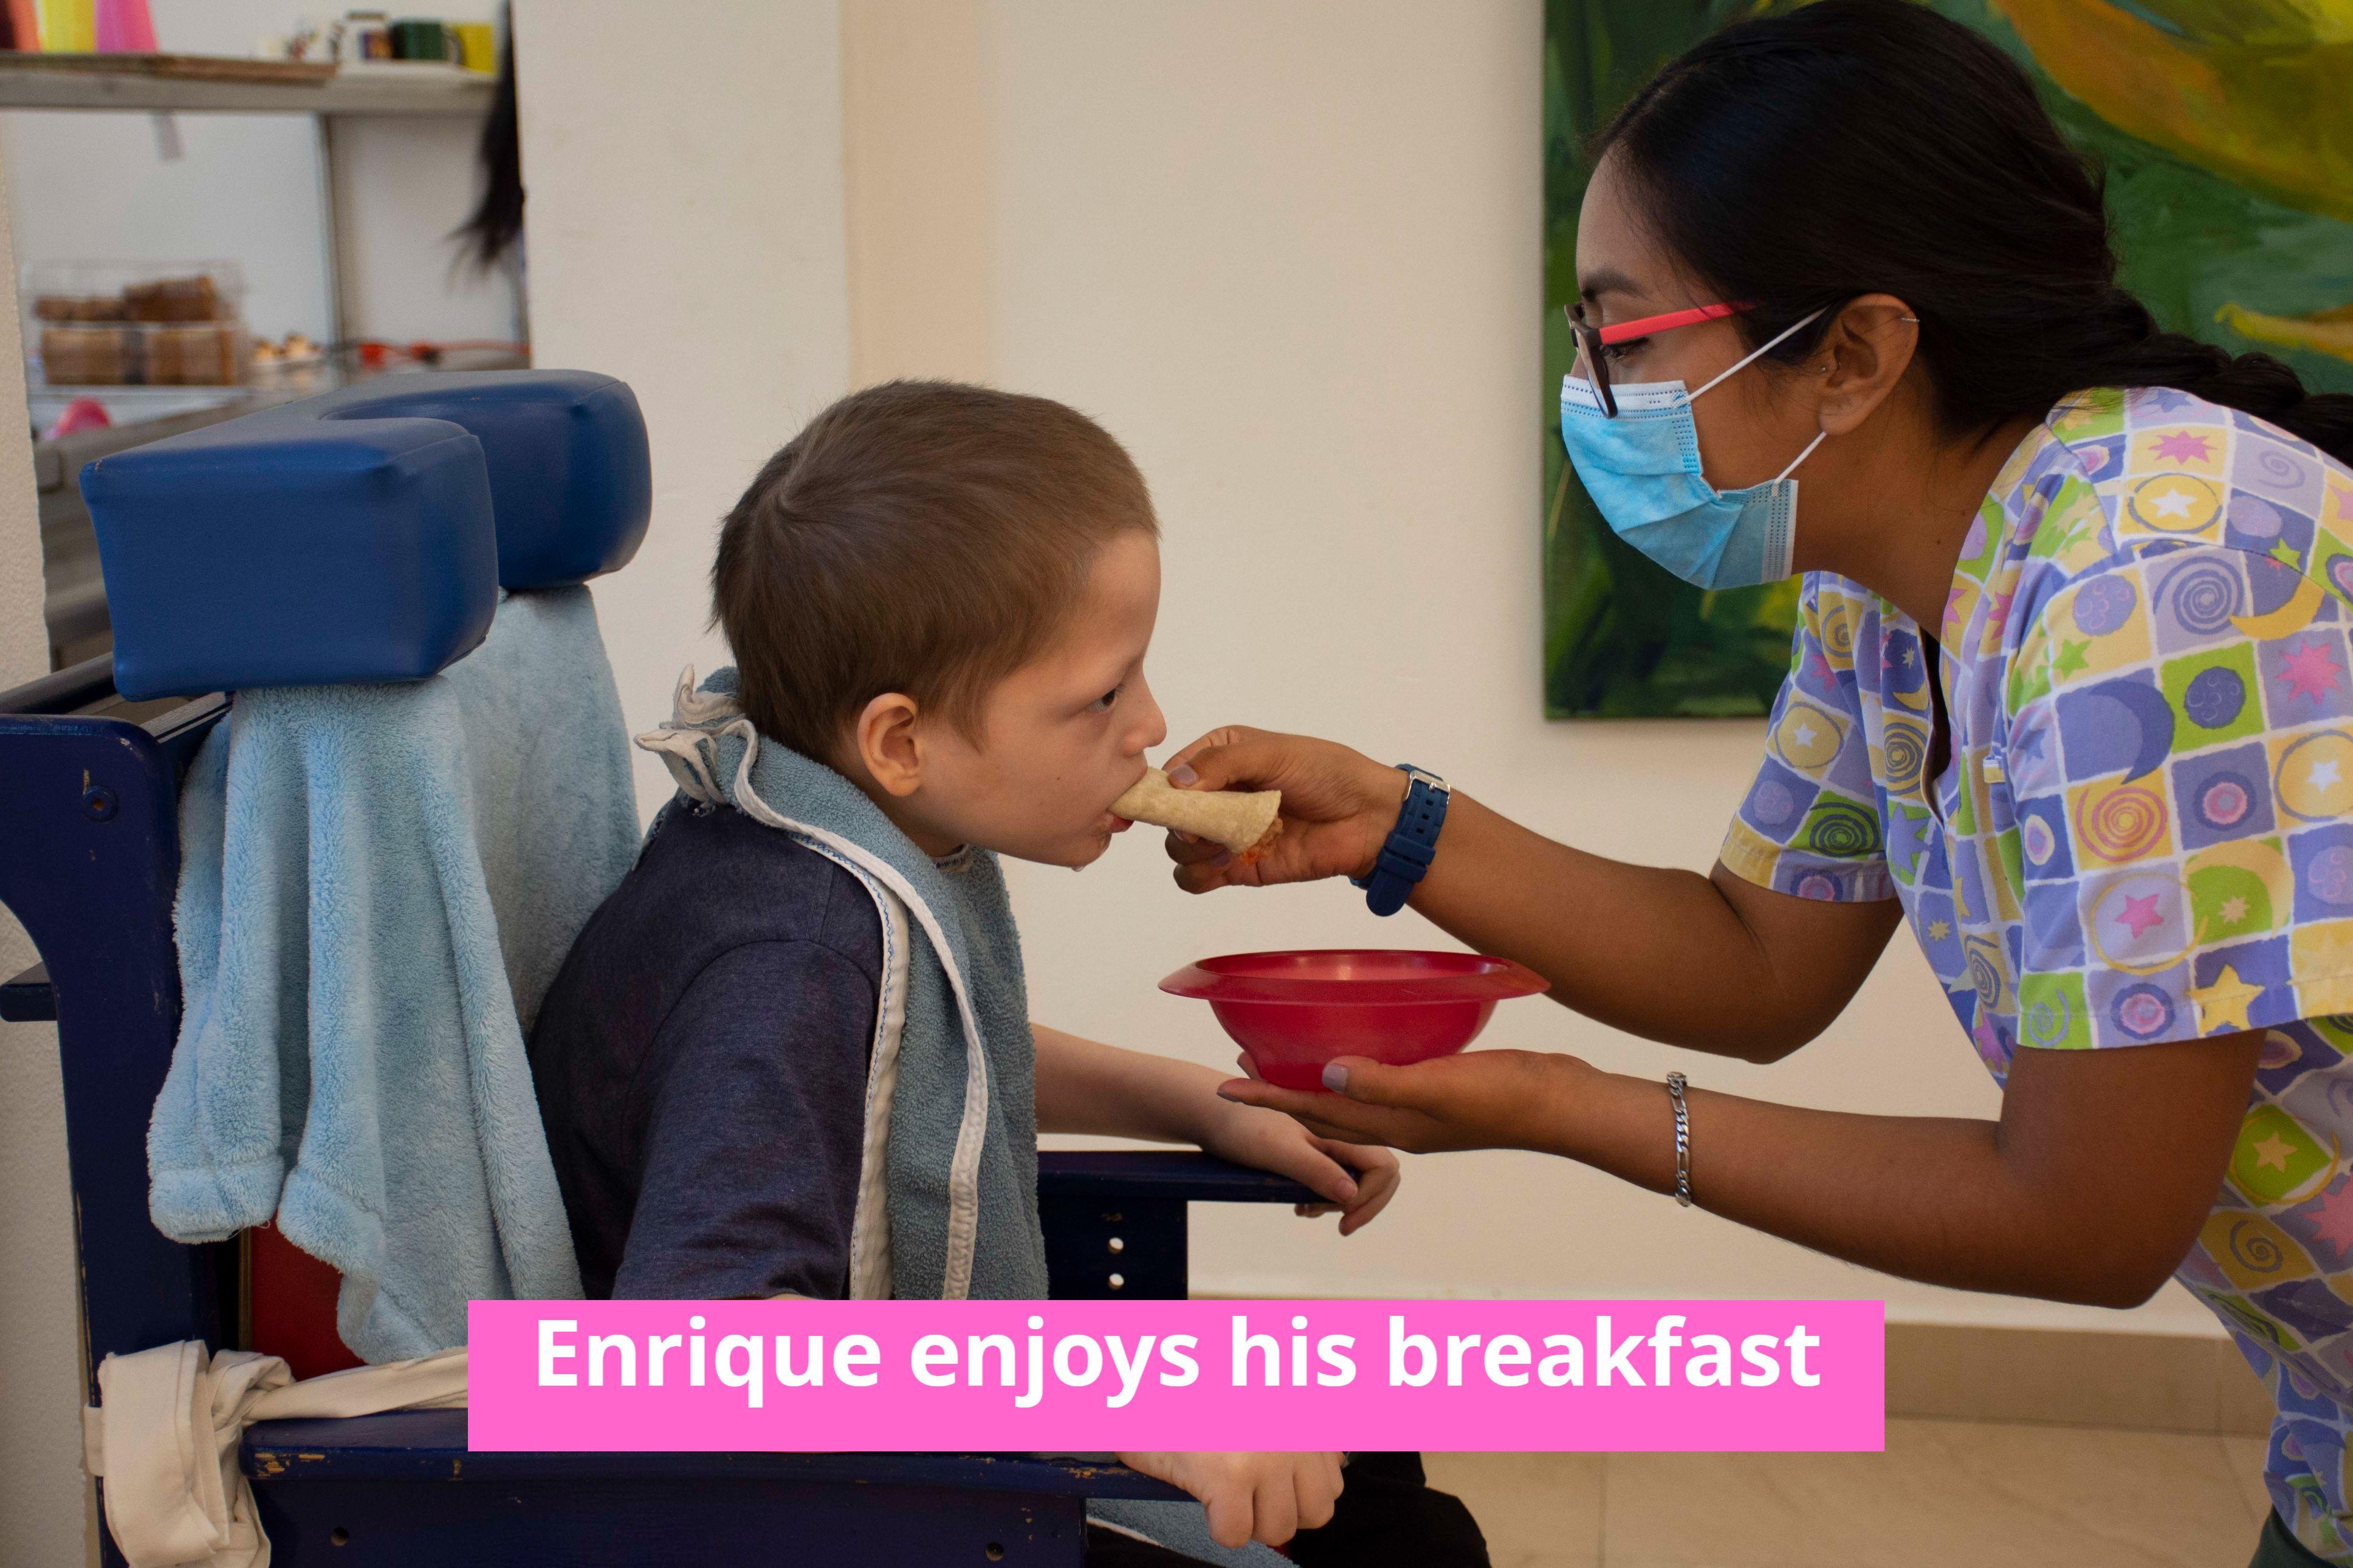 Enrique enjoying his breakfast